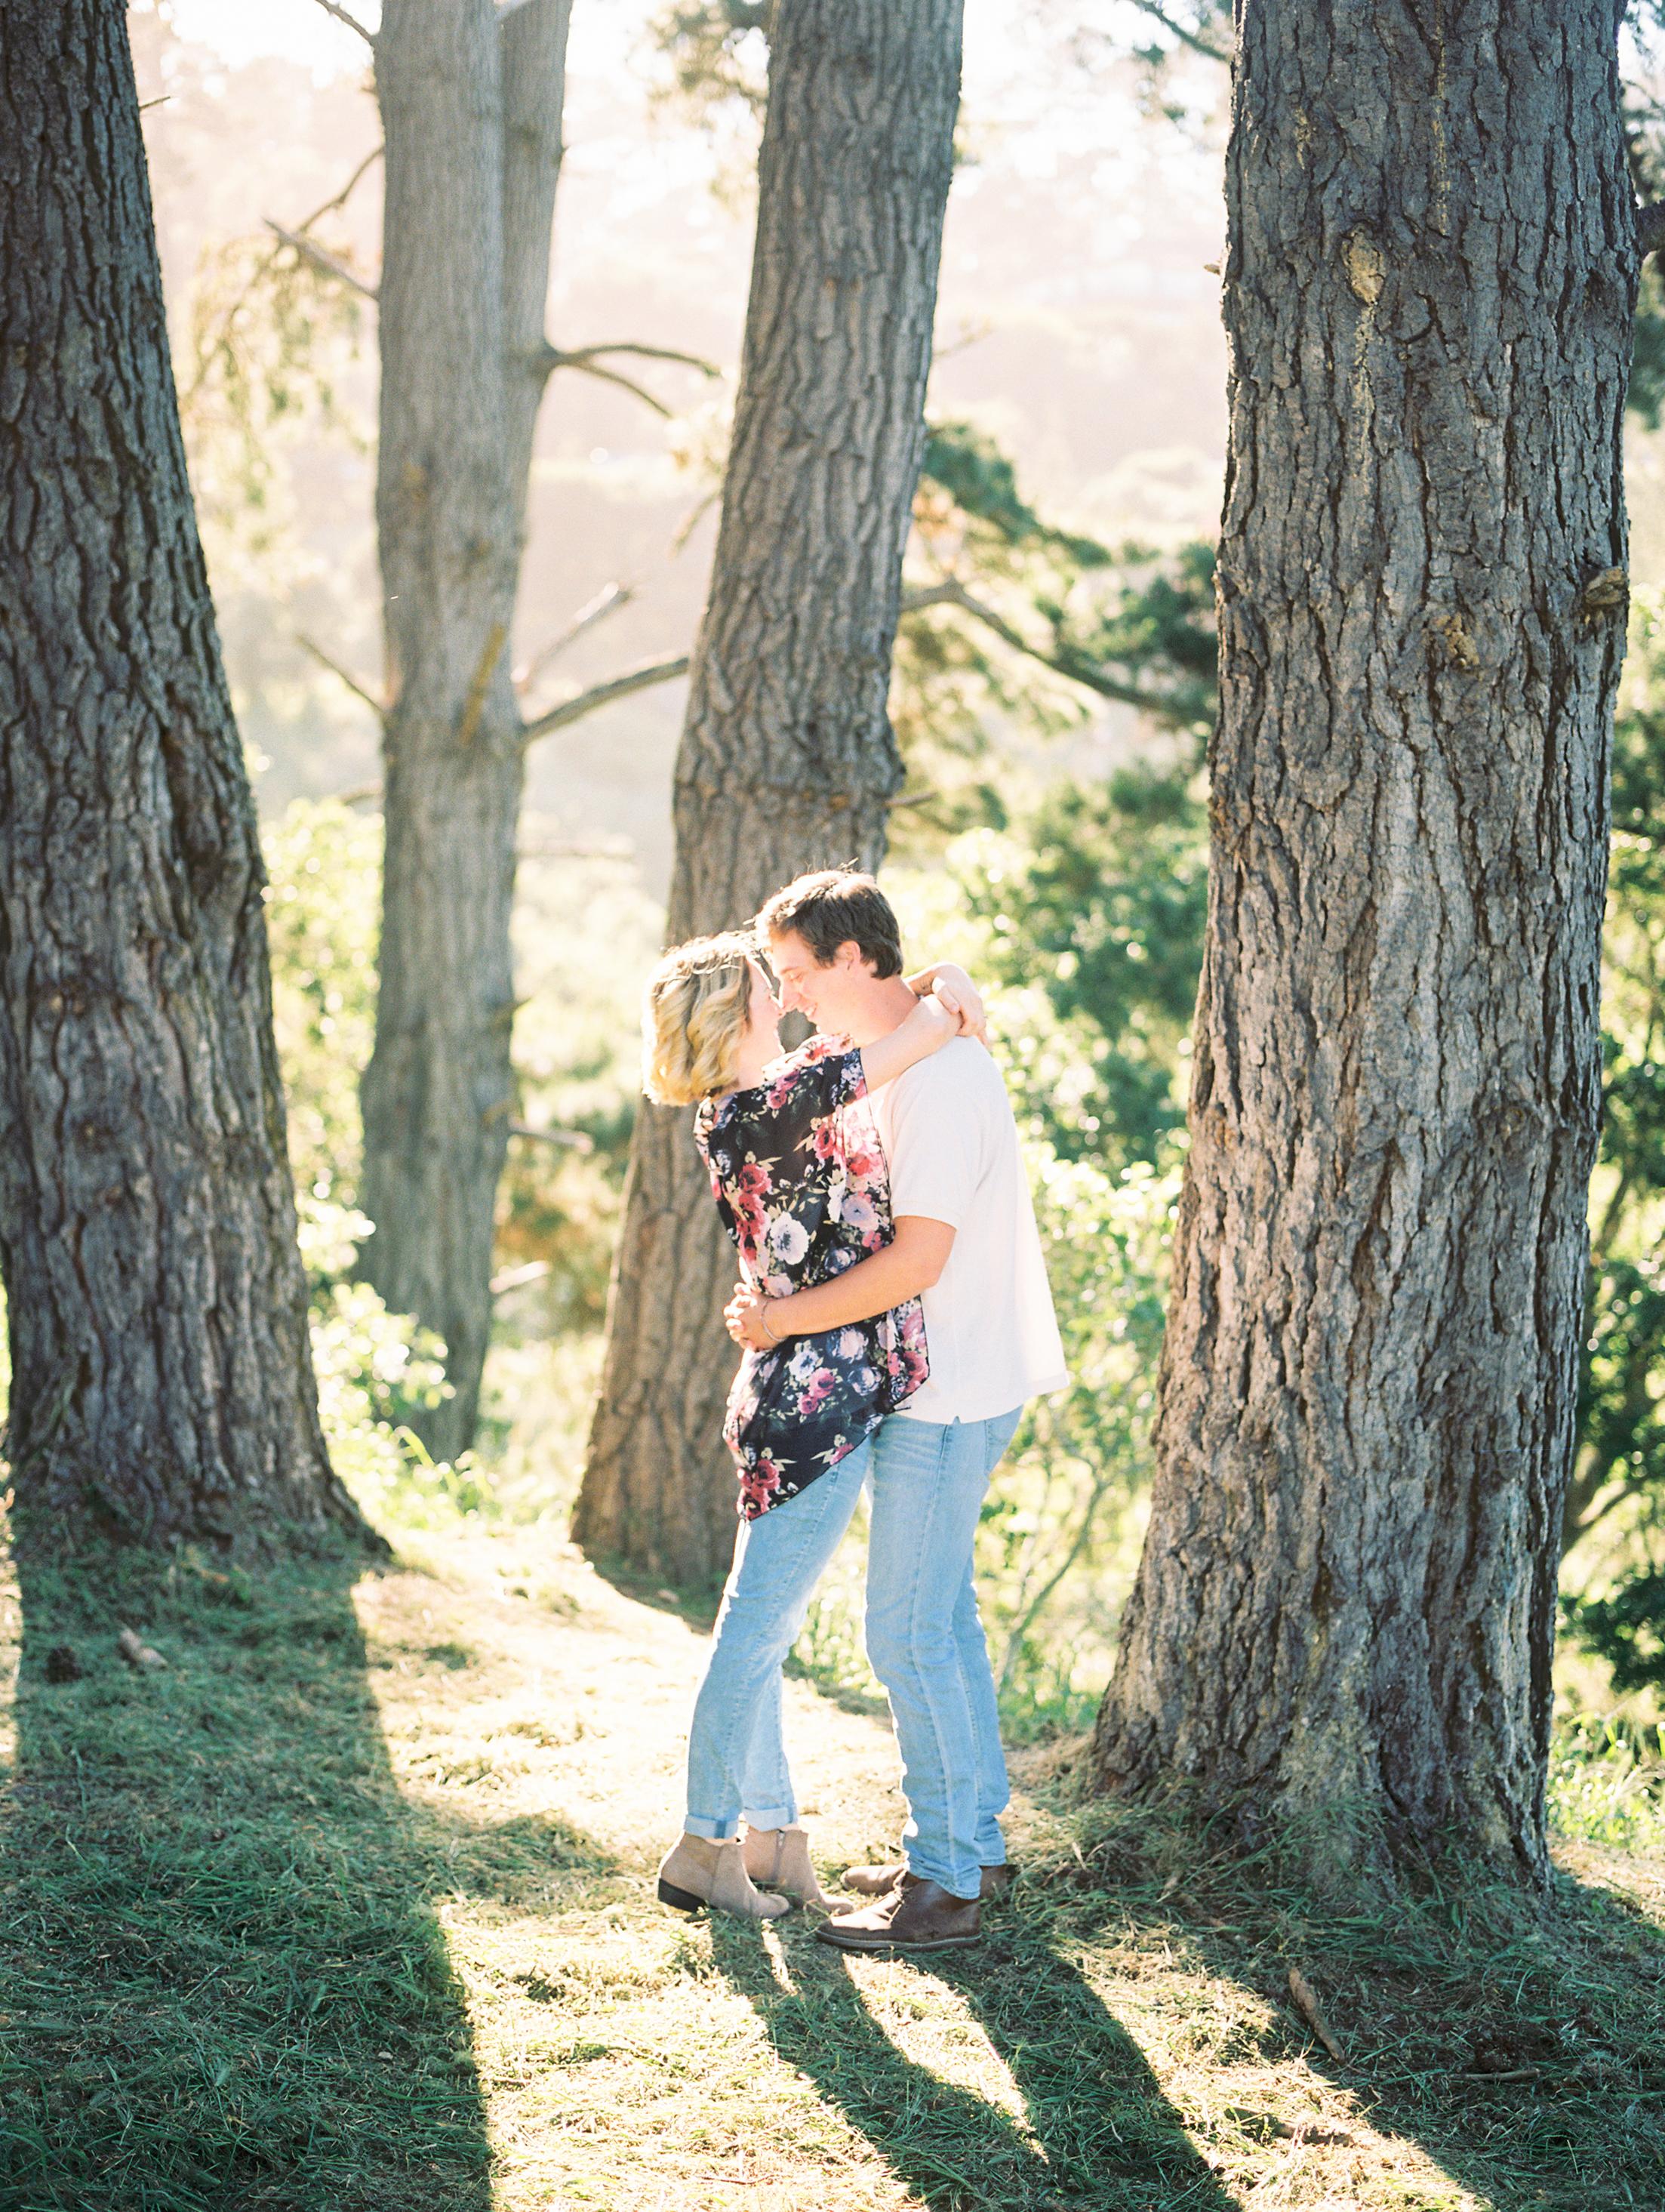 Ken Clayton Engagement-Ken Clayton Engagement-0178.jpg